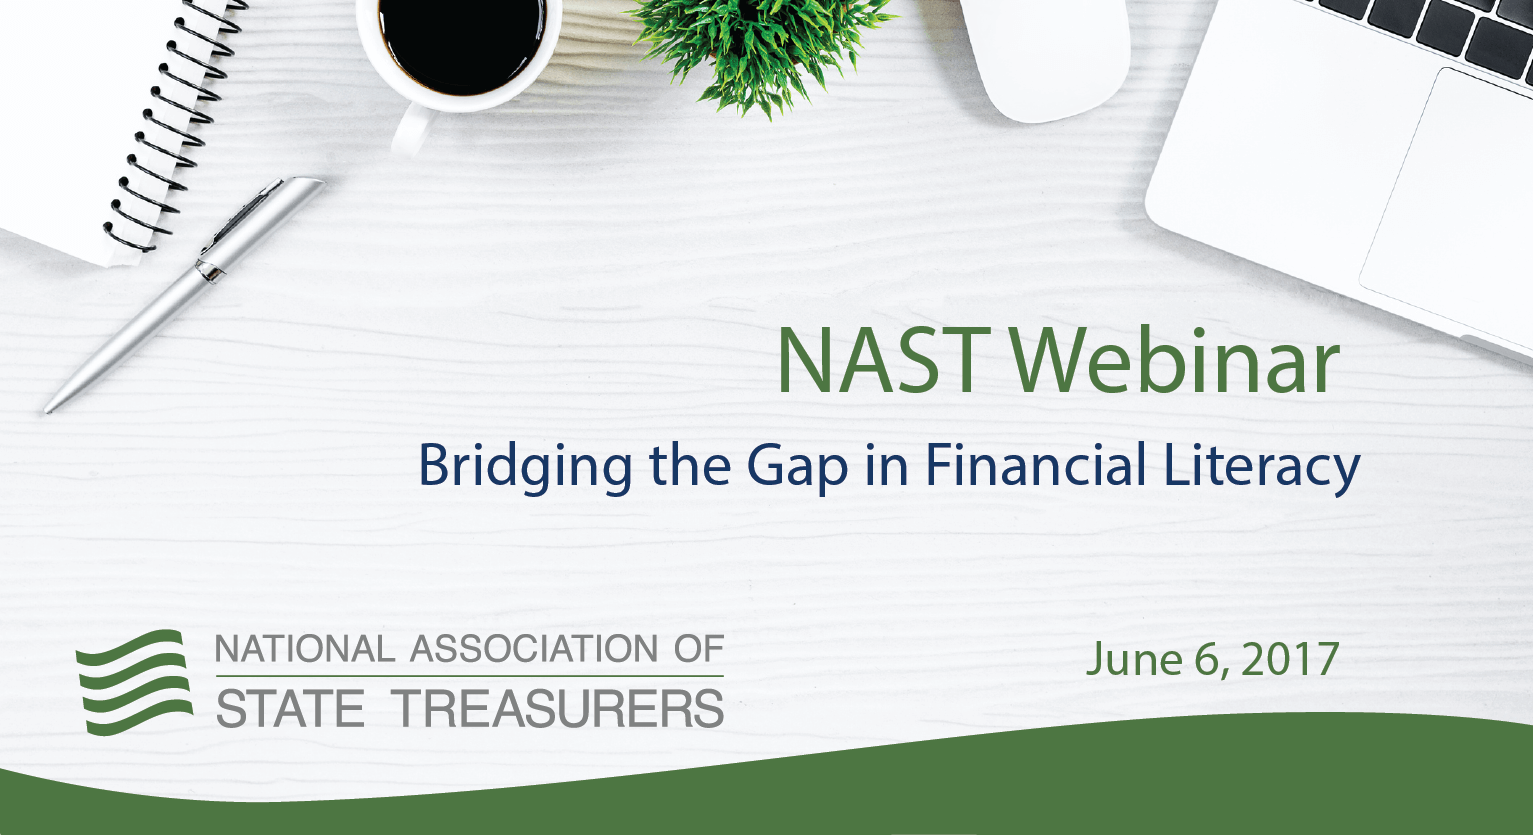 Bridging the Gap in Financial Literacy